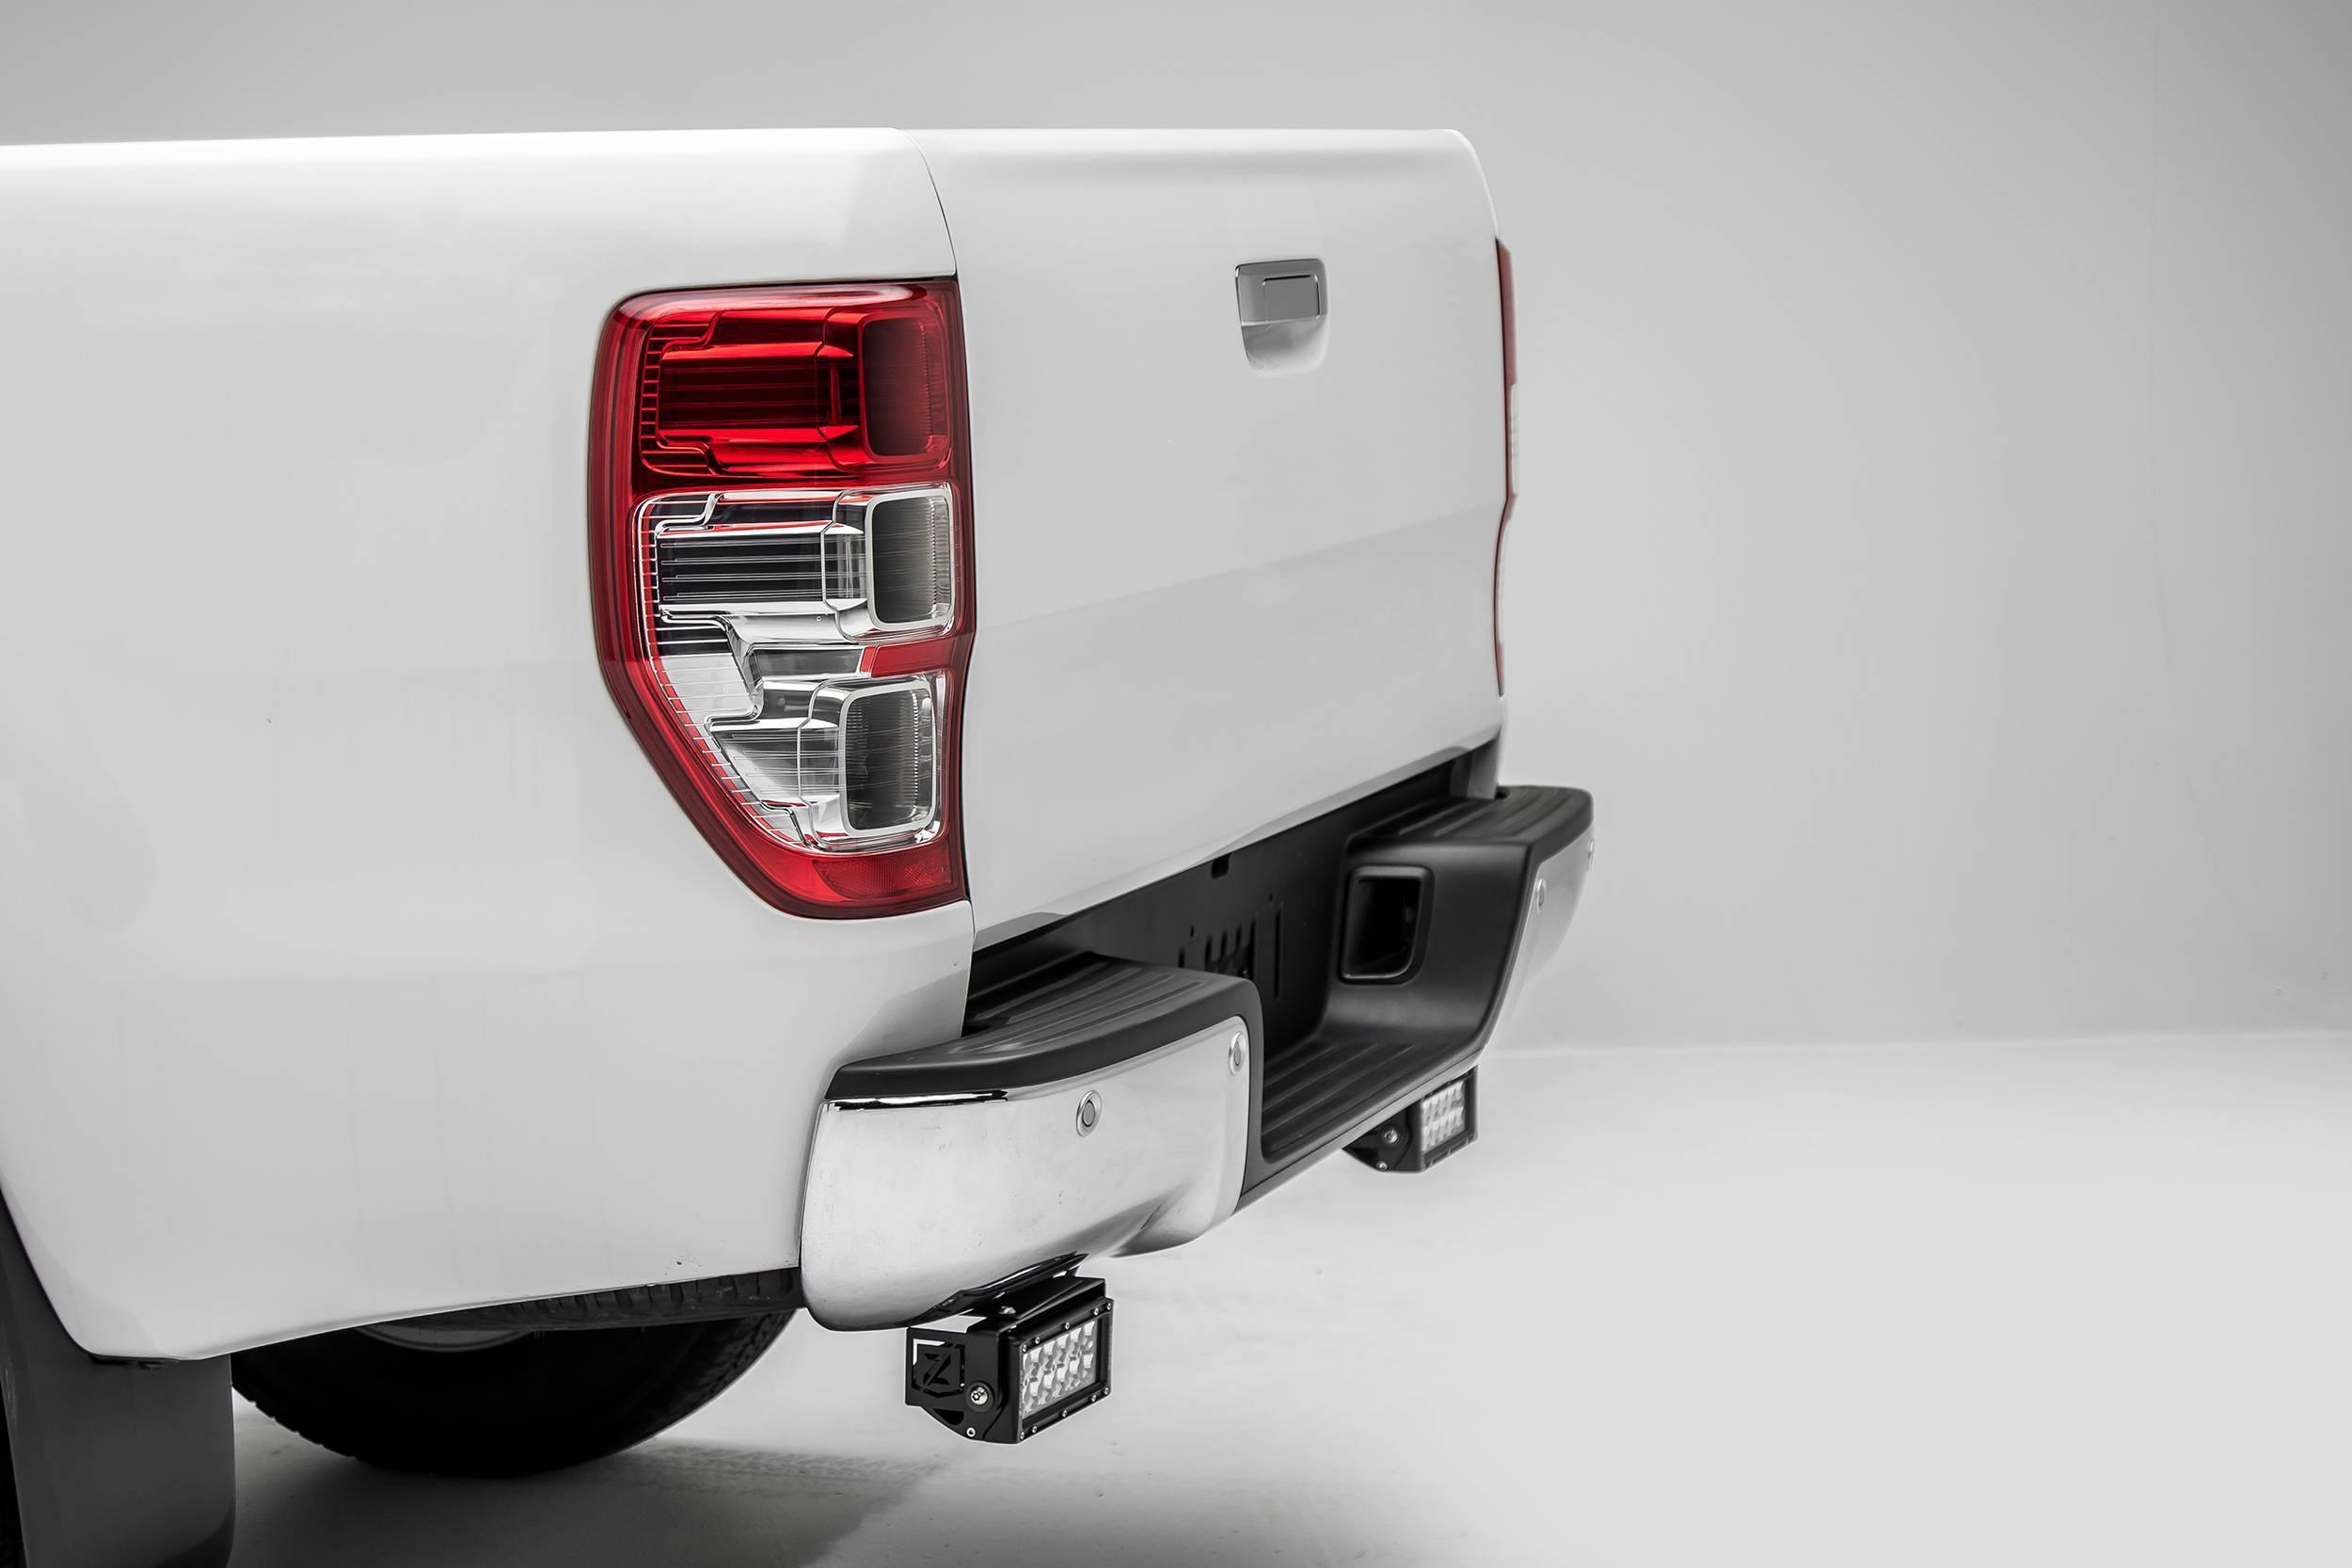 ZROADZ                                             - 2015-2018 Ford Ranger T6 Rear Bumper LED Kit with (2) 6 Inch LED Straight Double Row Light Bars - PN #Z385761-KIT